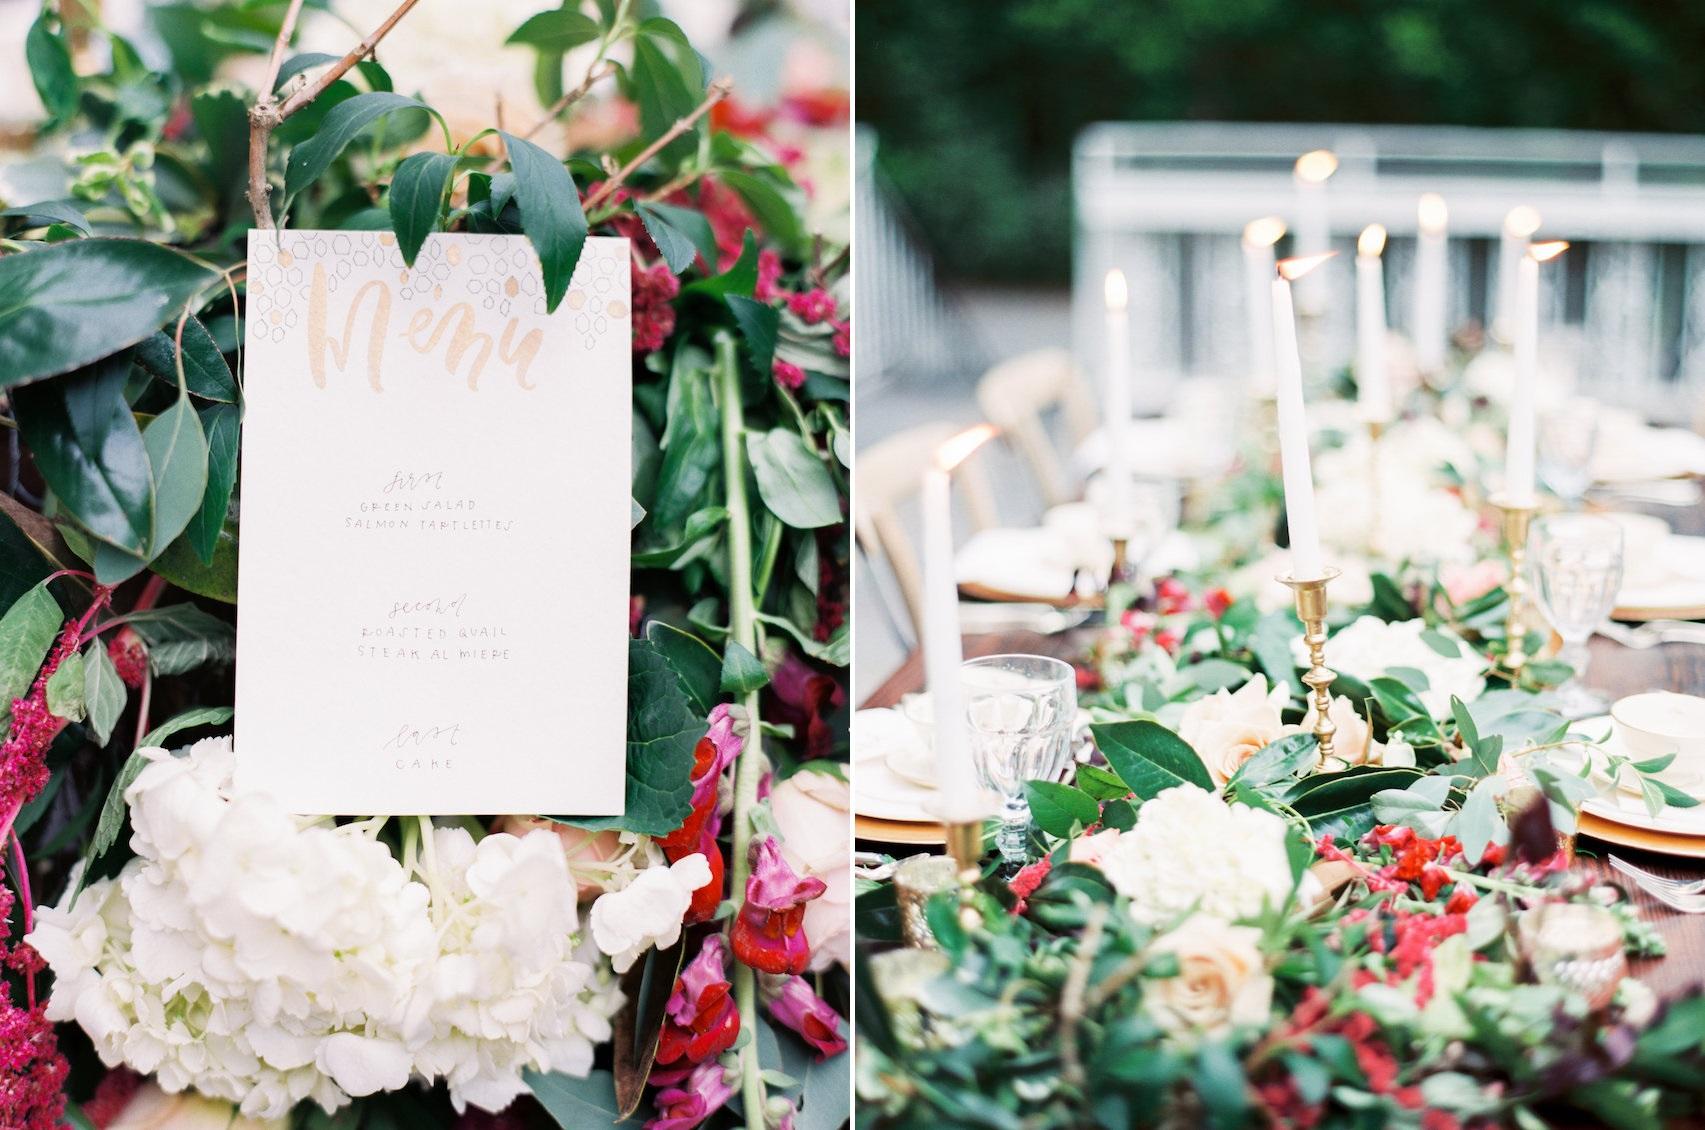 Romantic Wedding Table Menu & Candle Centerpiece